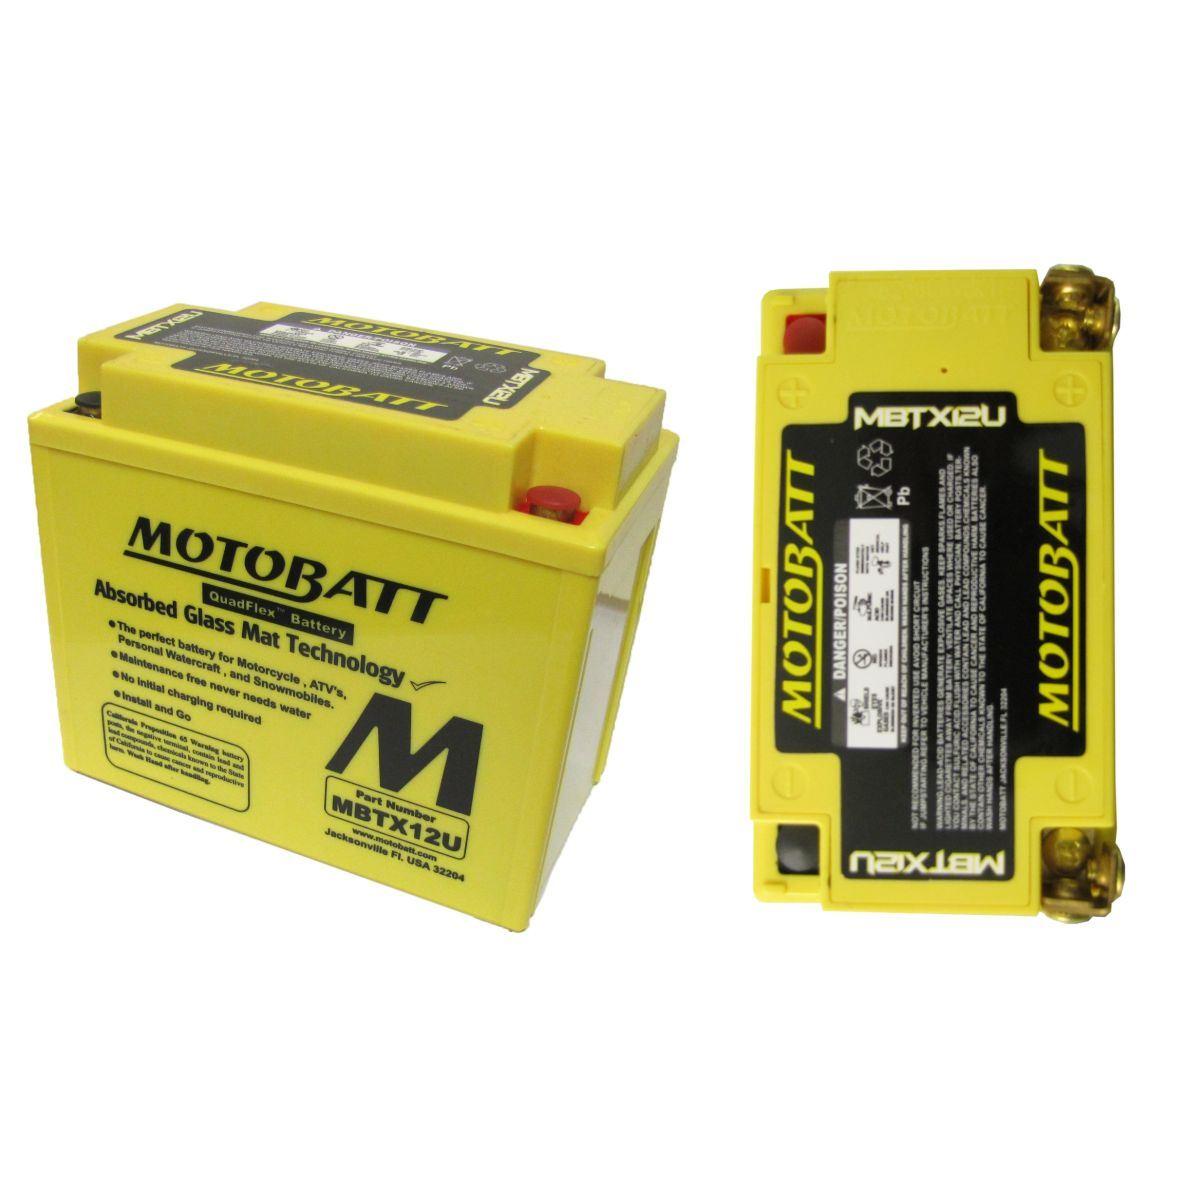 Battery-Motobatt-for-1998-Bimota-YB11-1100cc